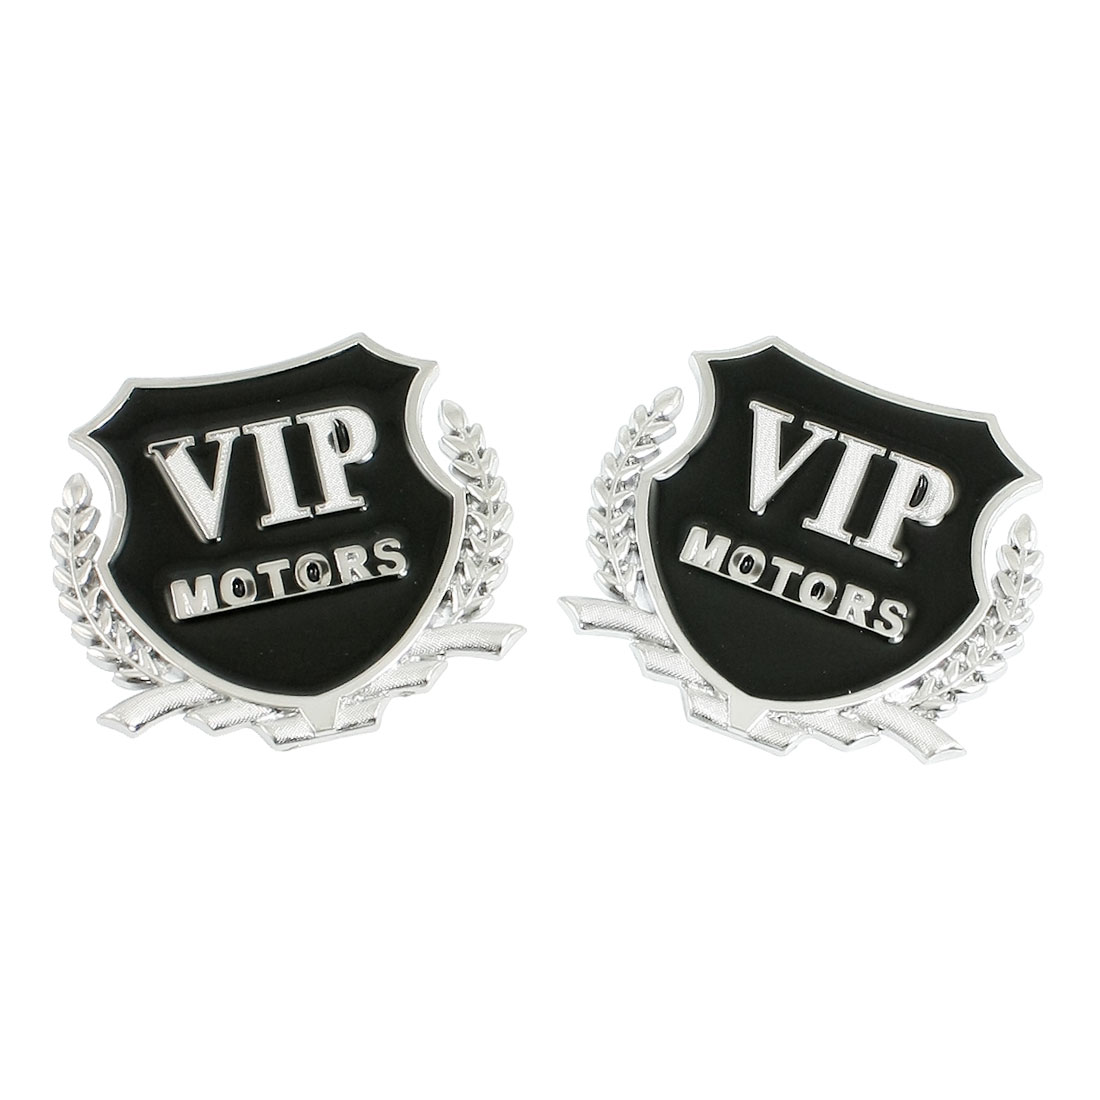 2 Pcs Car Decorative 3D VIP Letters Badge Emblem Decal Sticker Silver Tone Black